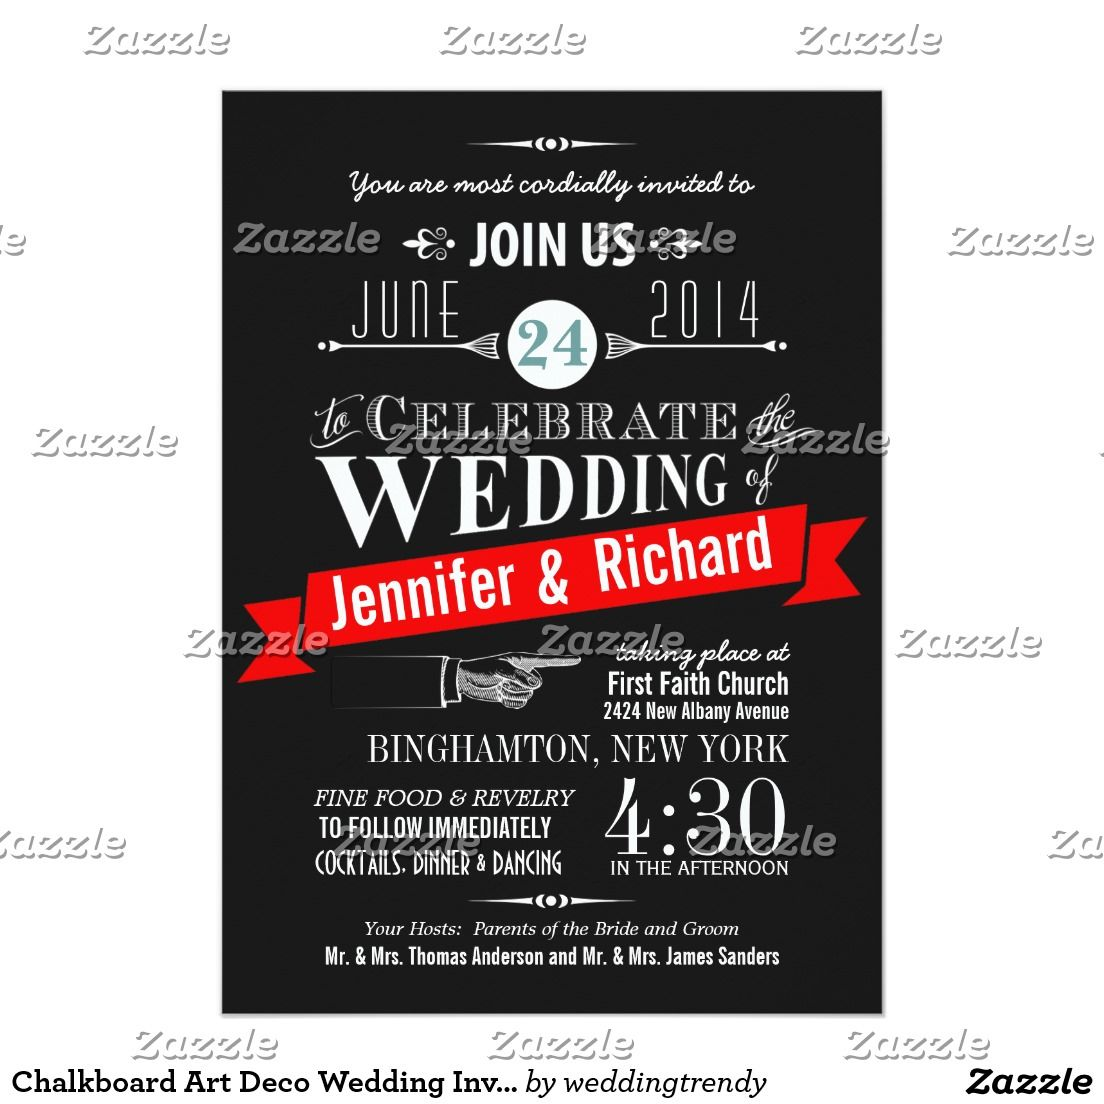 Contemporary Zazzle Vintage Wedding Invitations Image Collection ...